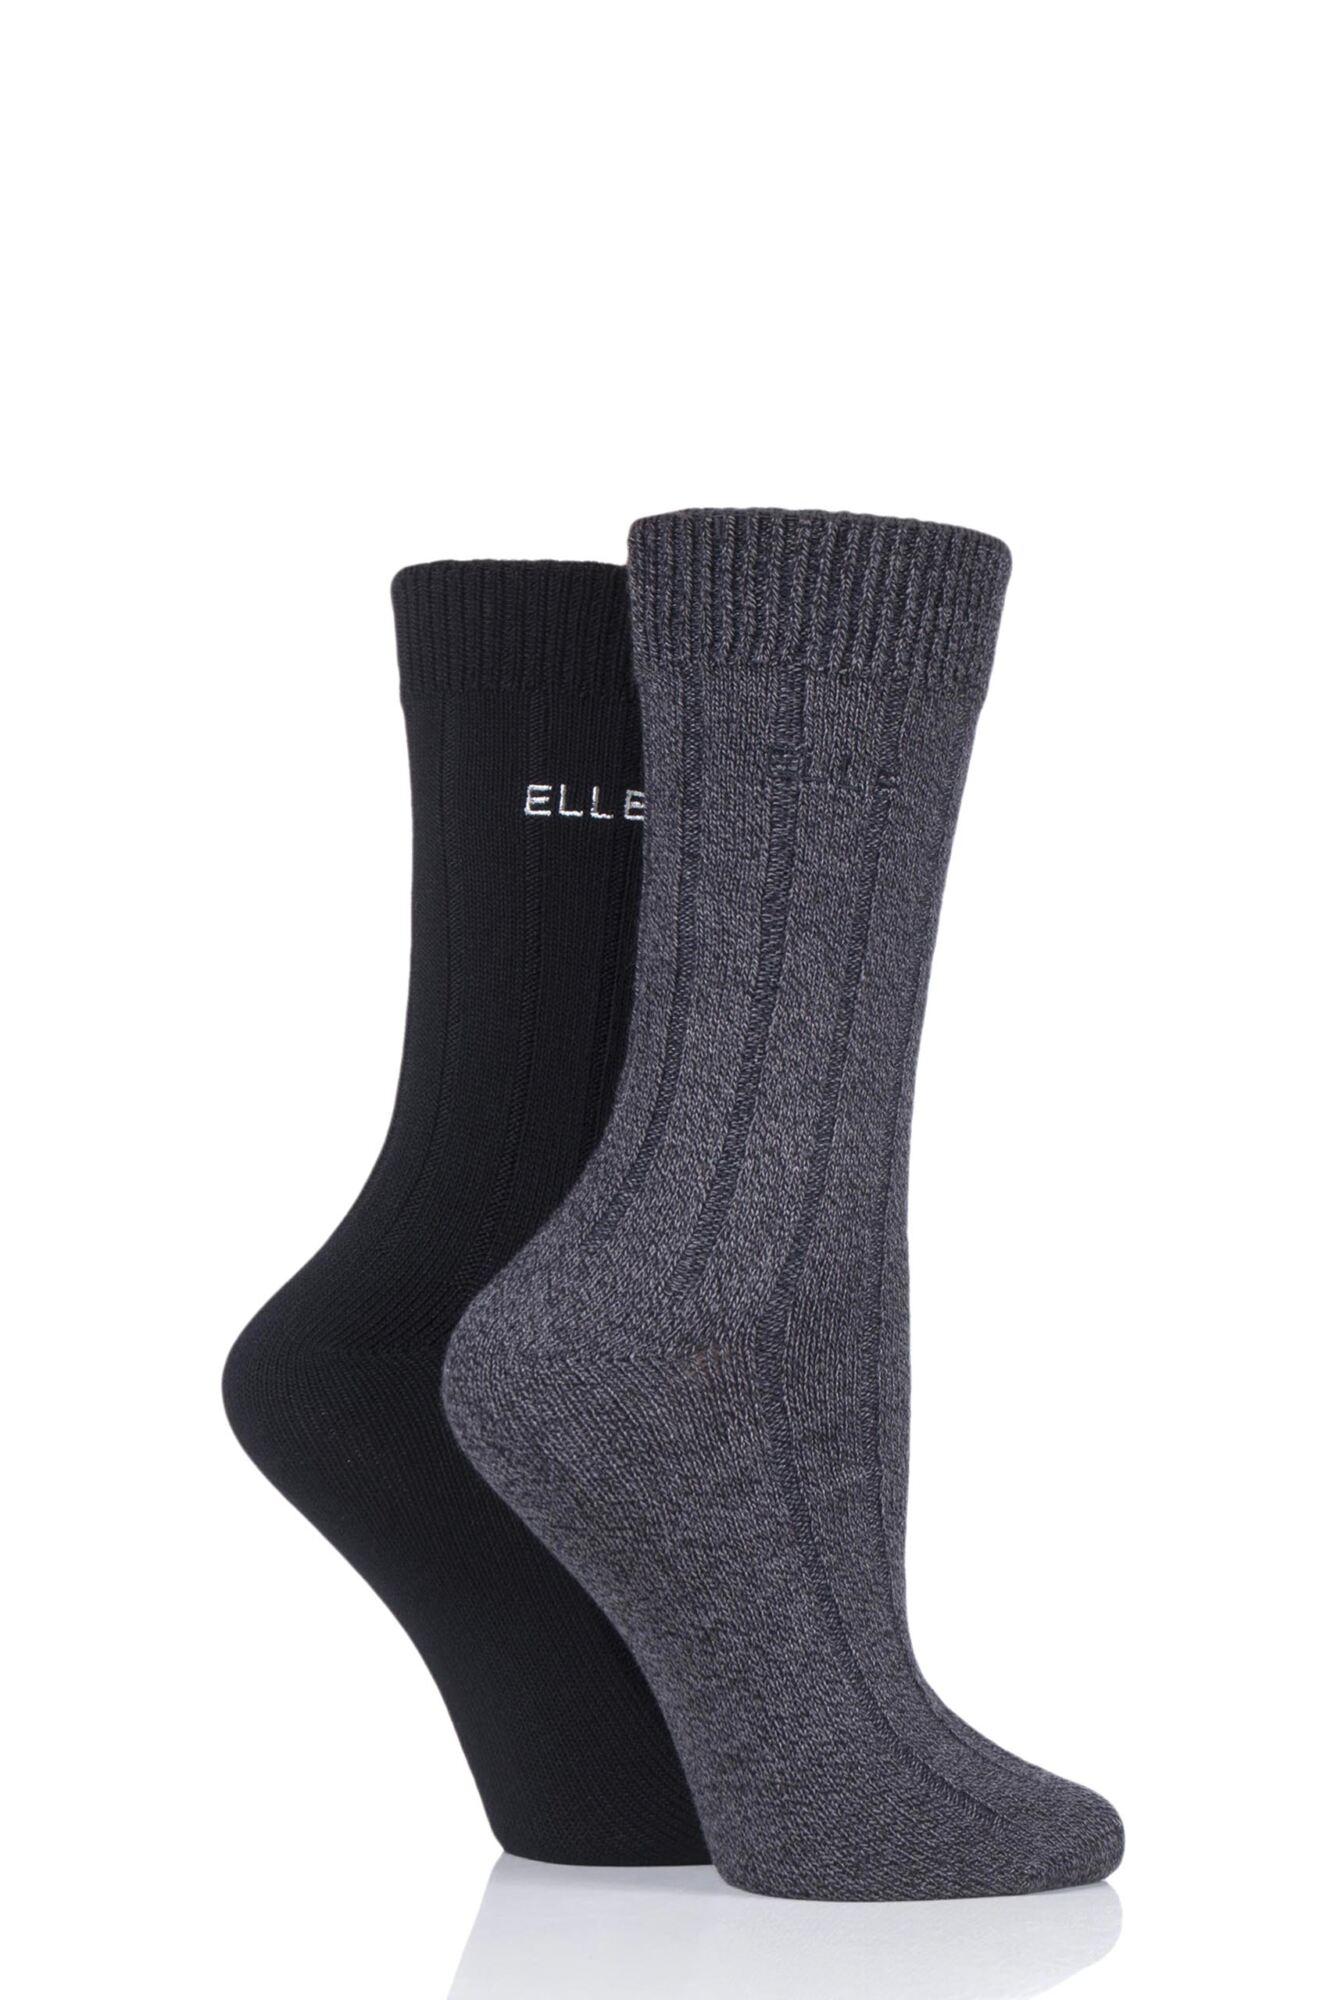 2 Pair Ribbed Bamboo Boot Socks Ladies - Elle